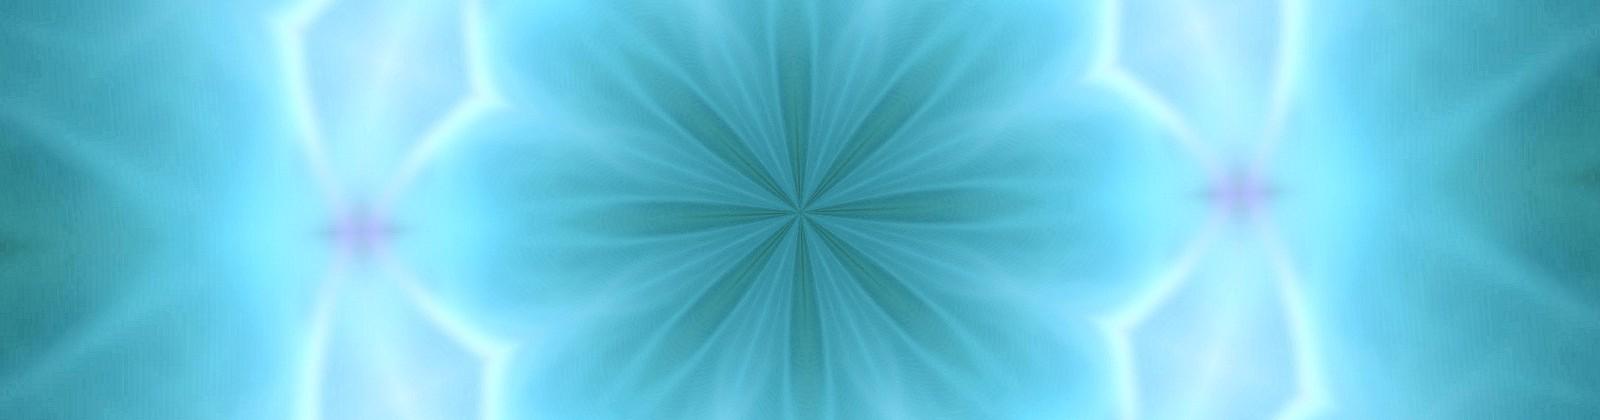 volmaakt kristal